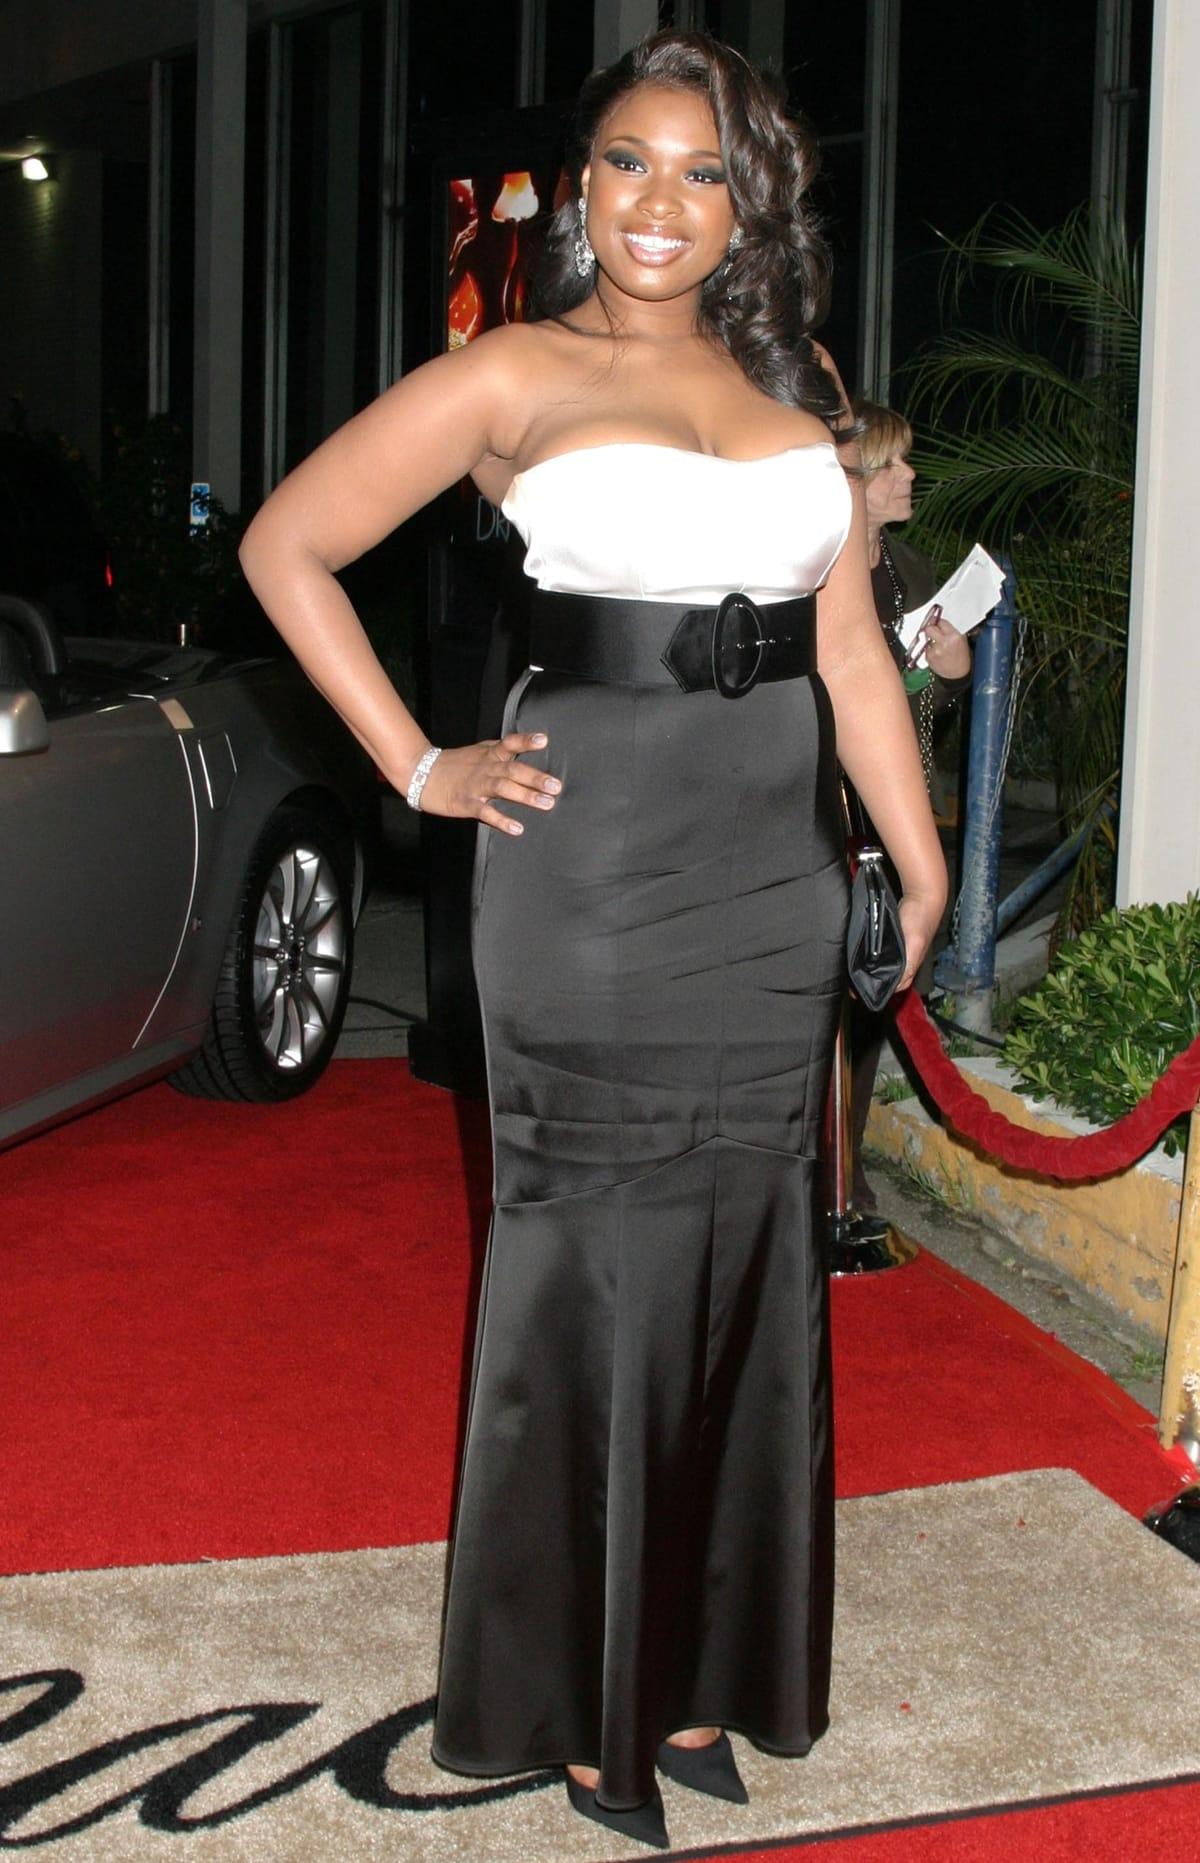 Jennifer Hudson at the Los Angeles premiere of Dreamgirls